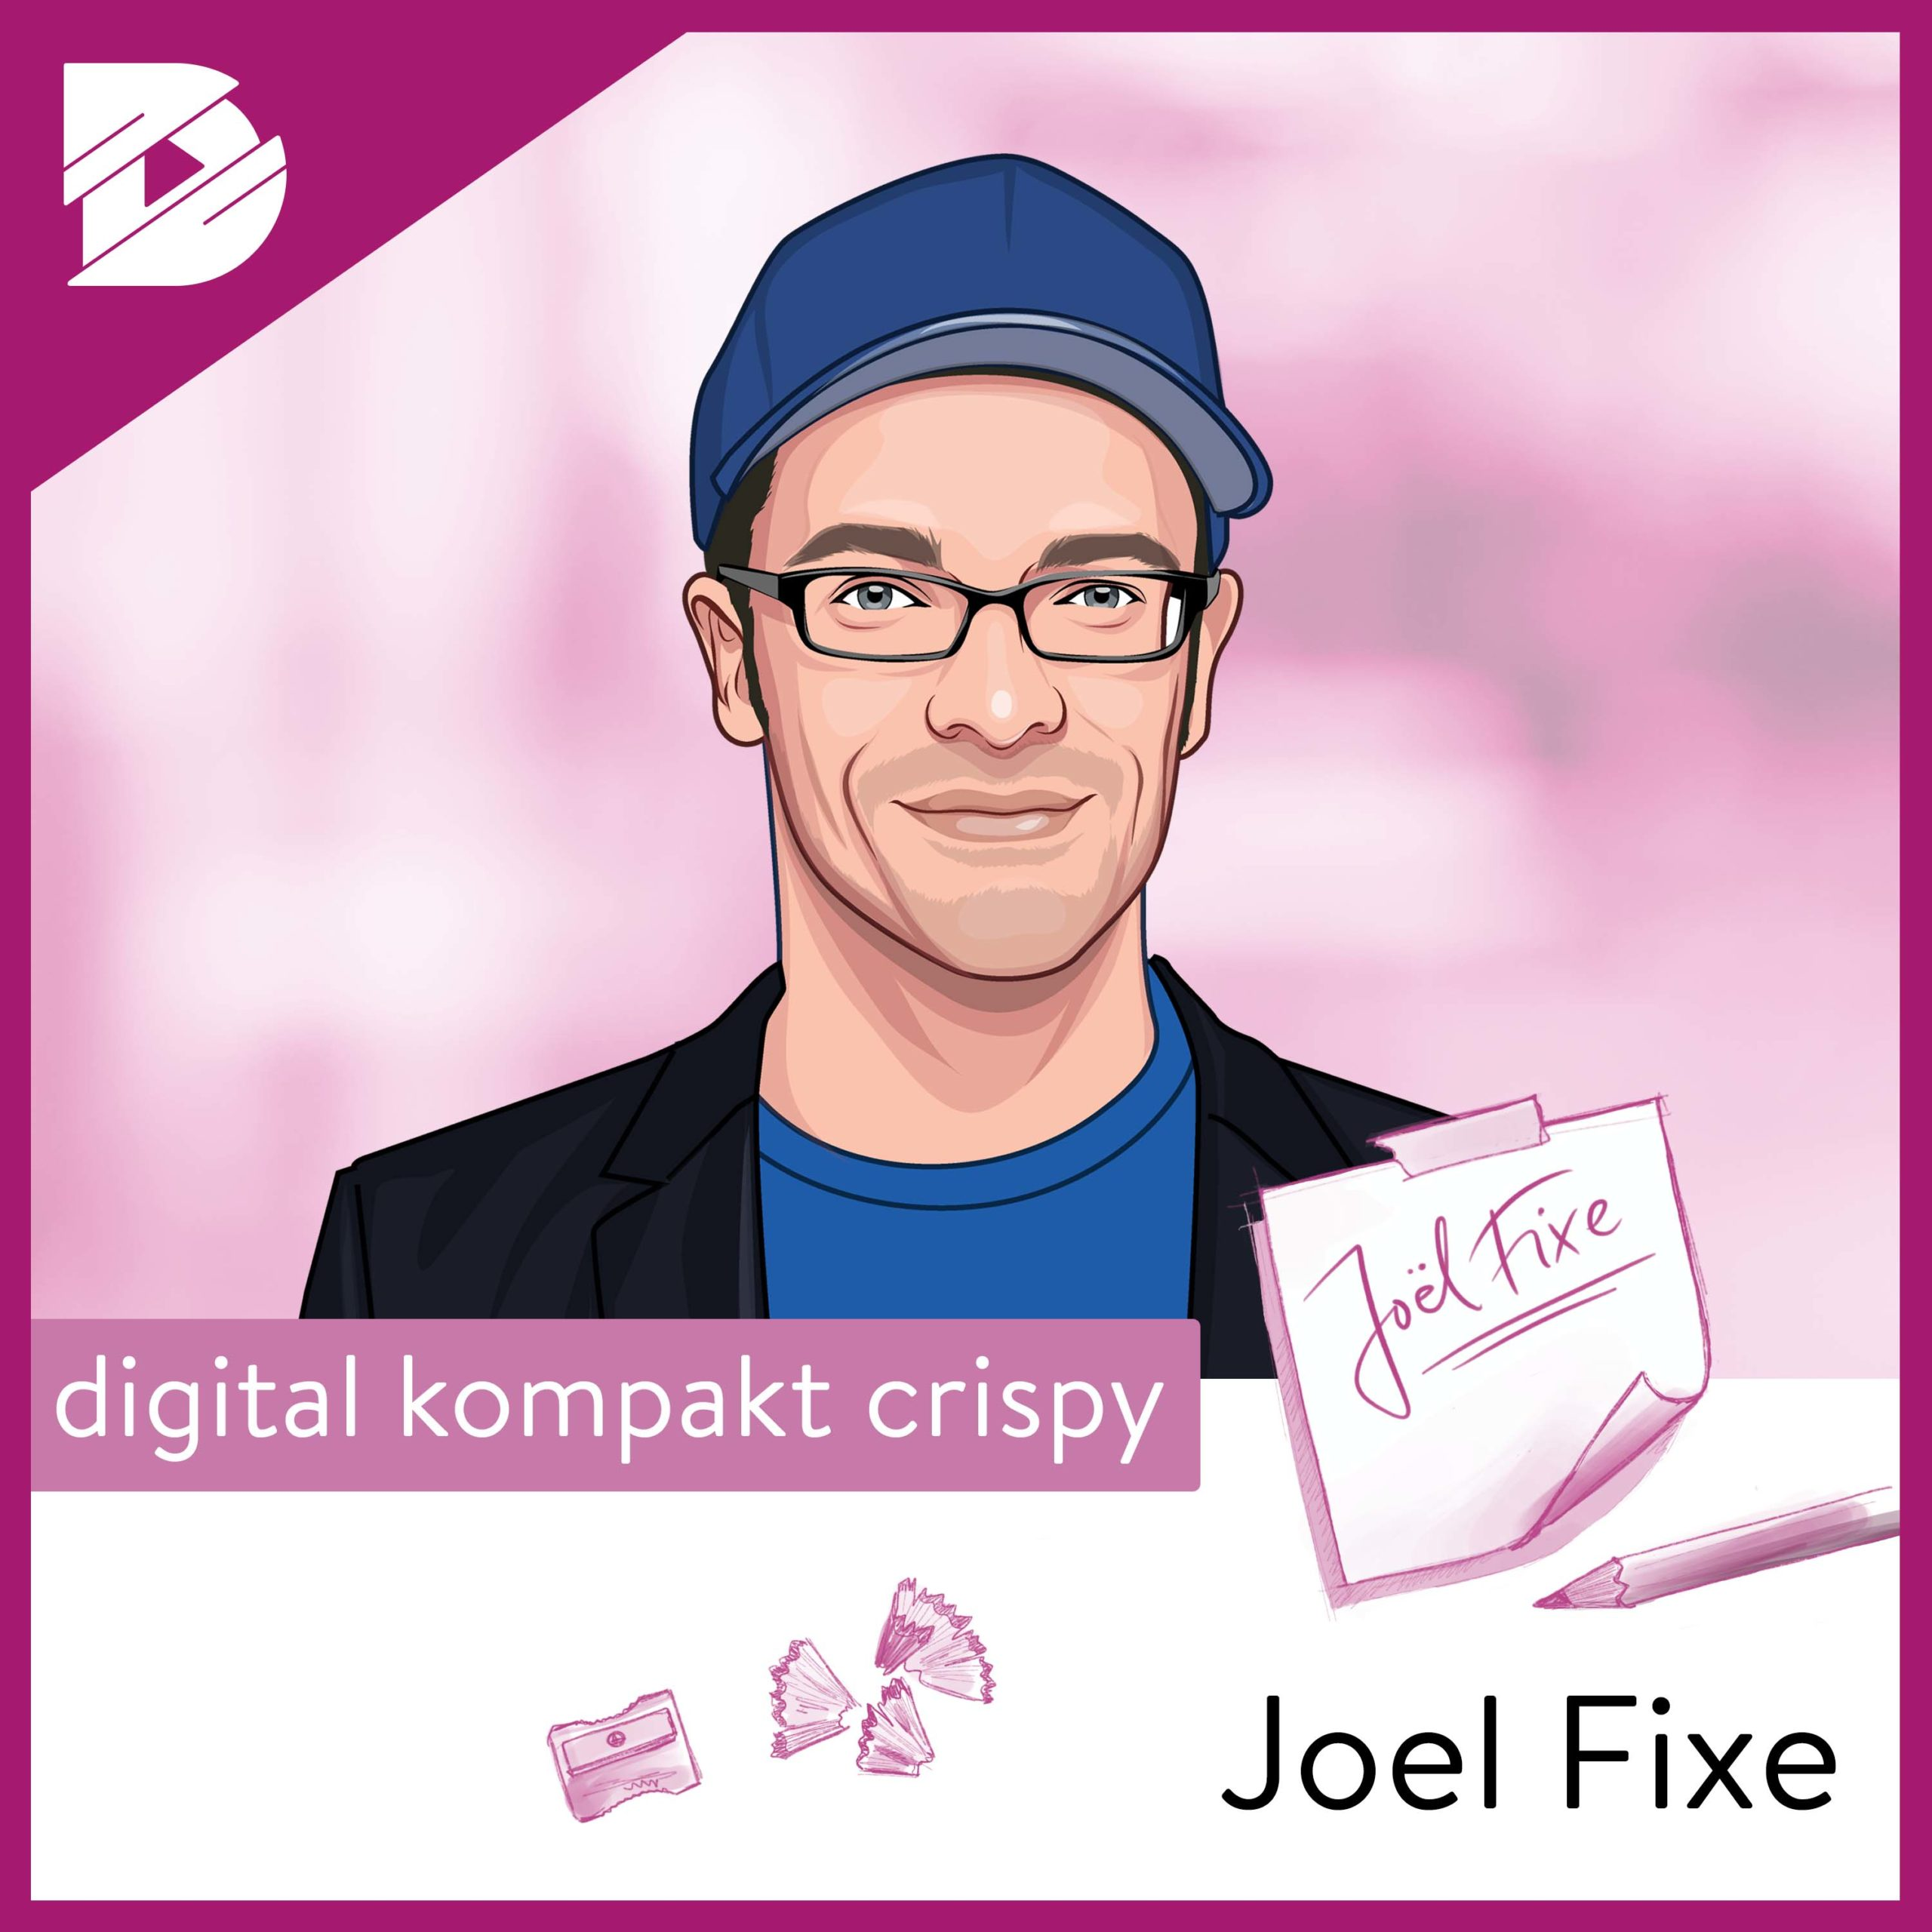 Joel Fixe